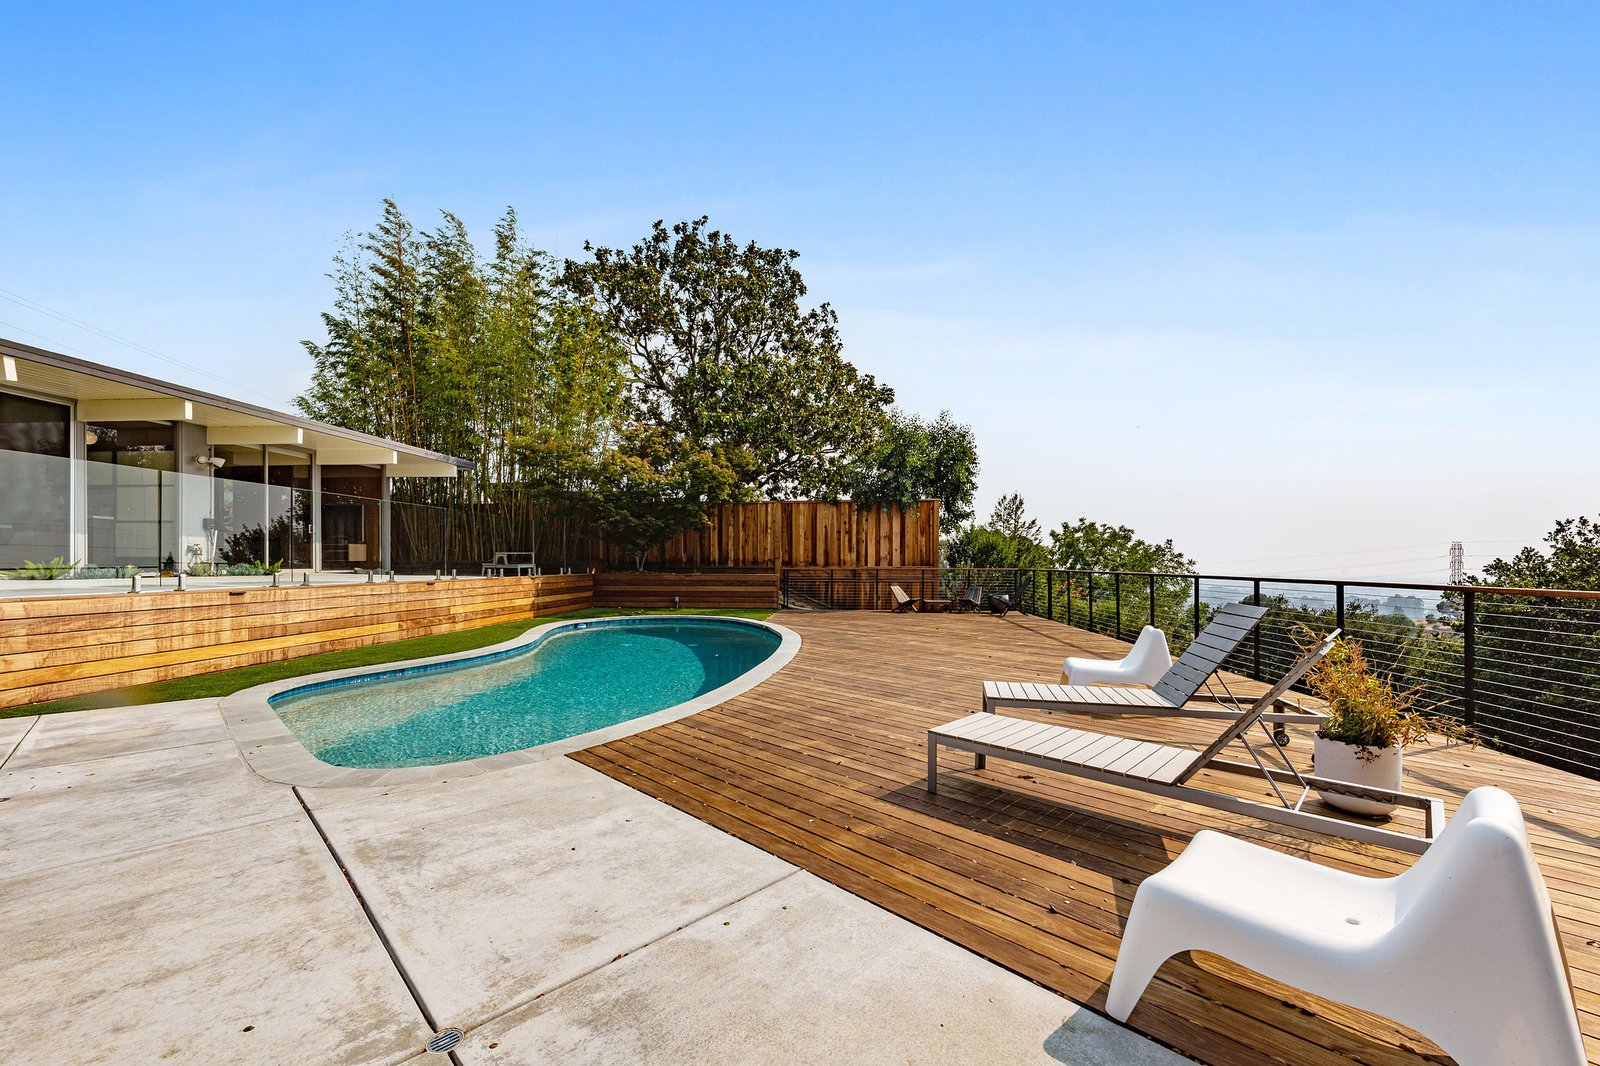 A. Quincy Jones Eichler Bay Area Real Estate solar heated pool